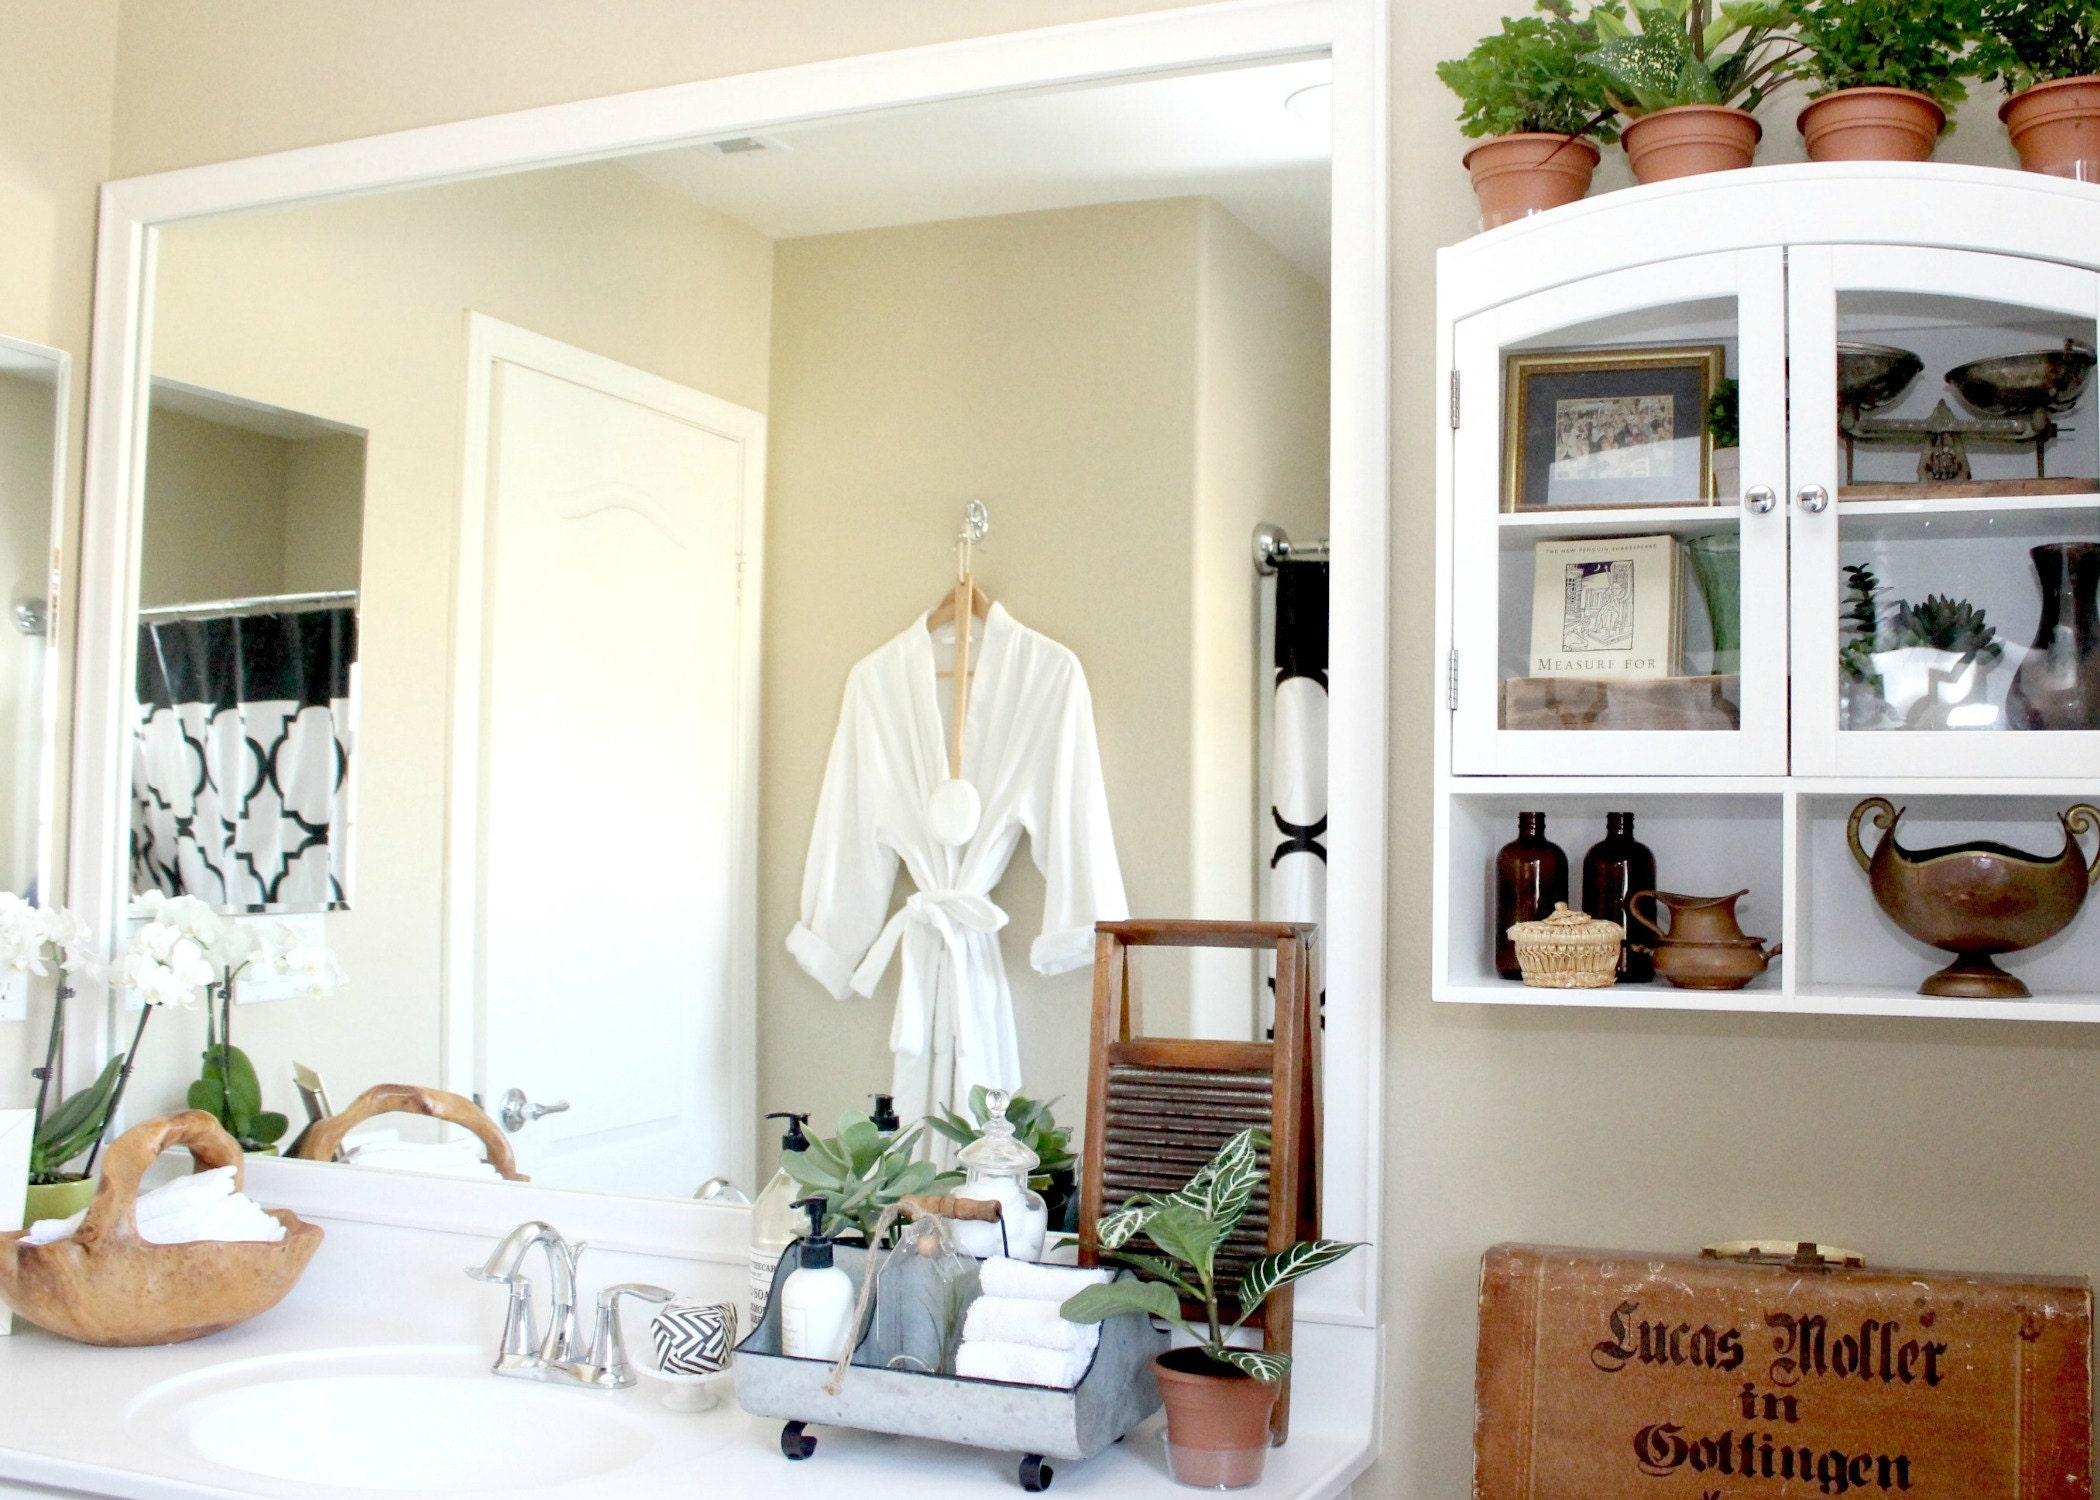 DIY Mirror Frame Kit & Vintage Bathroom Decor